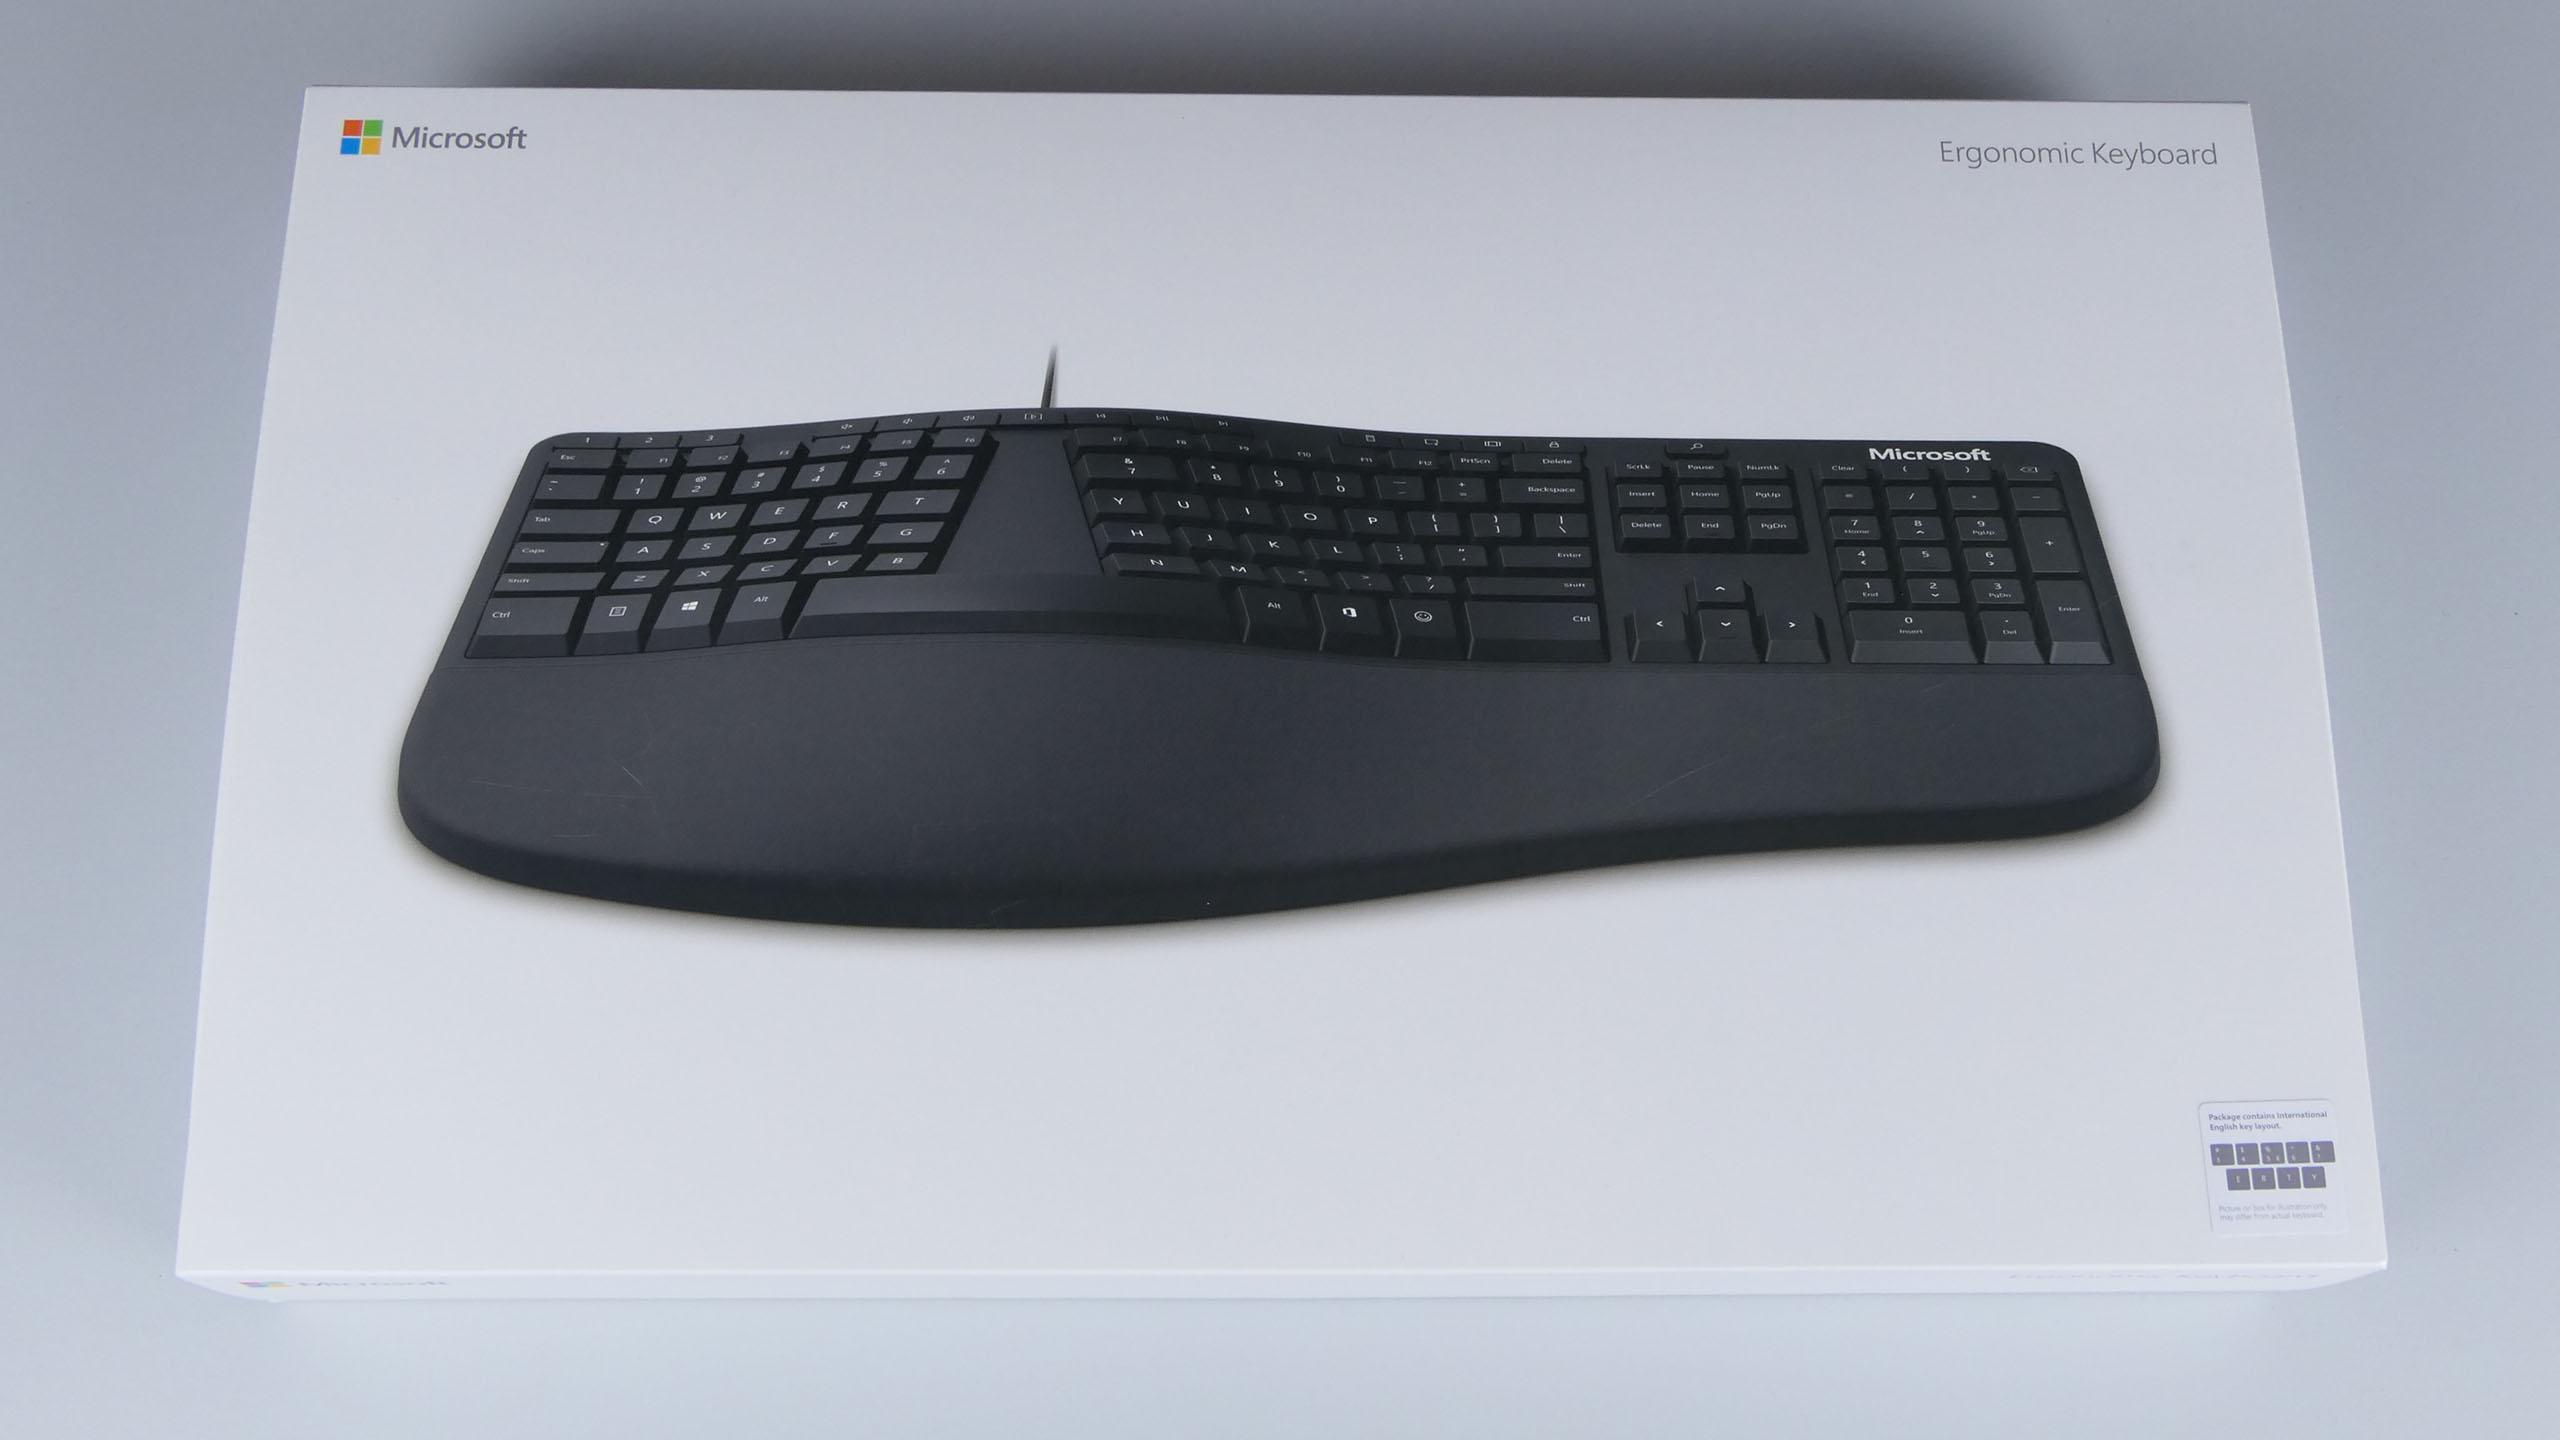 Microsoft Ergonomic Keyboard